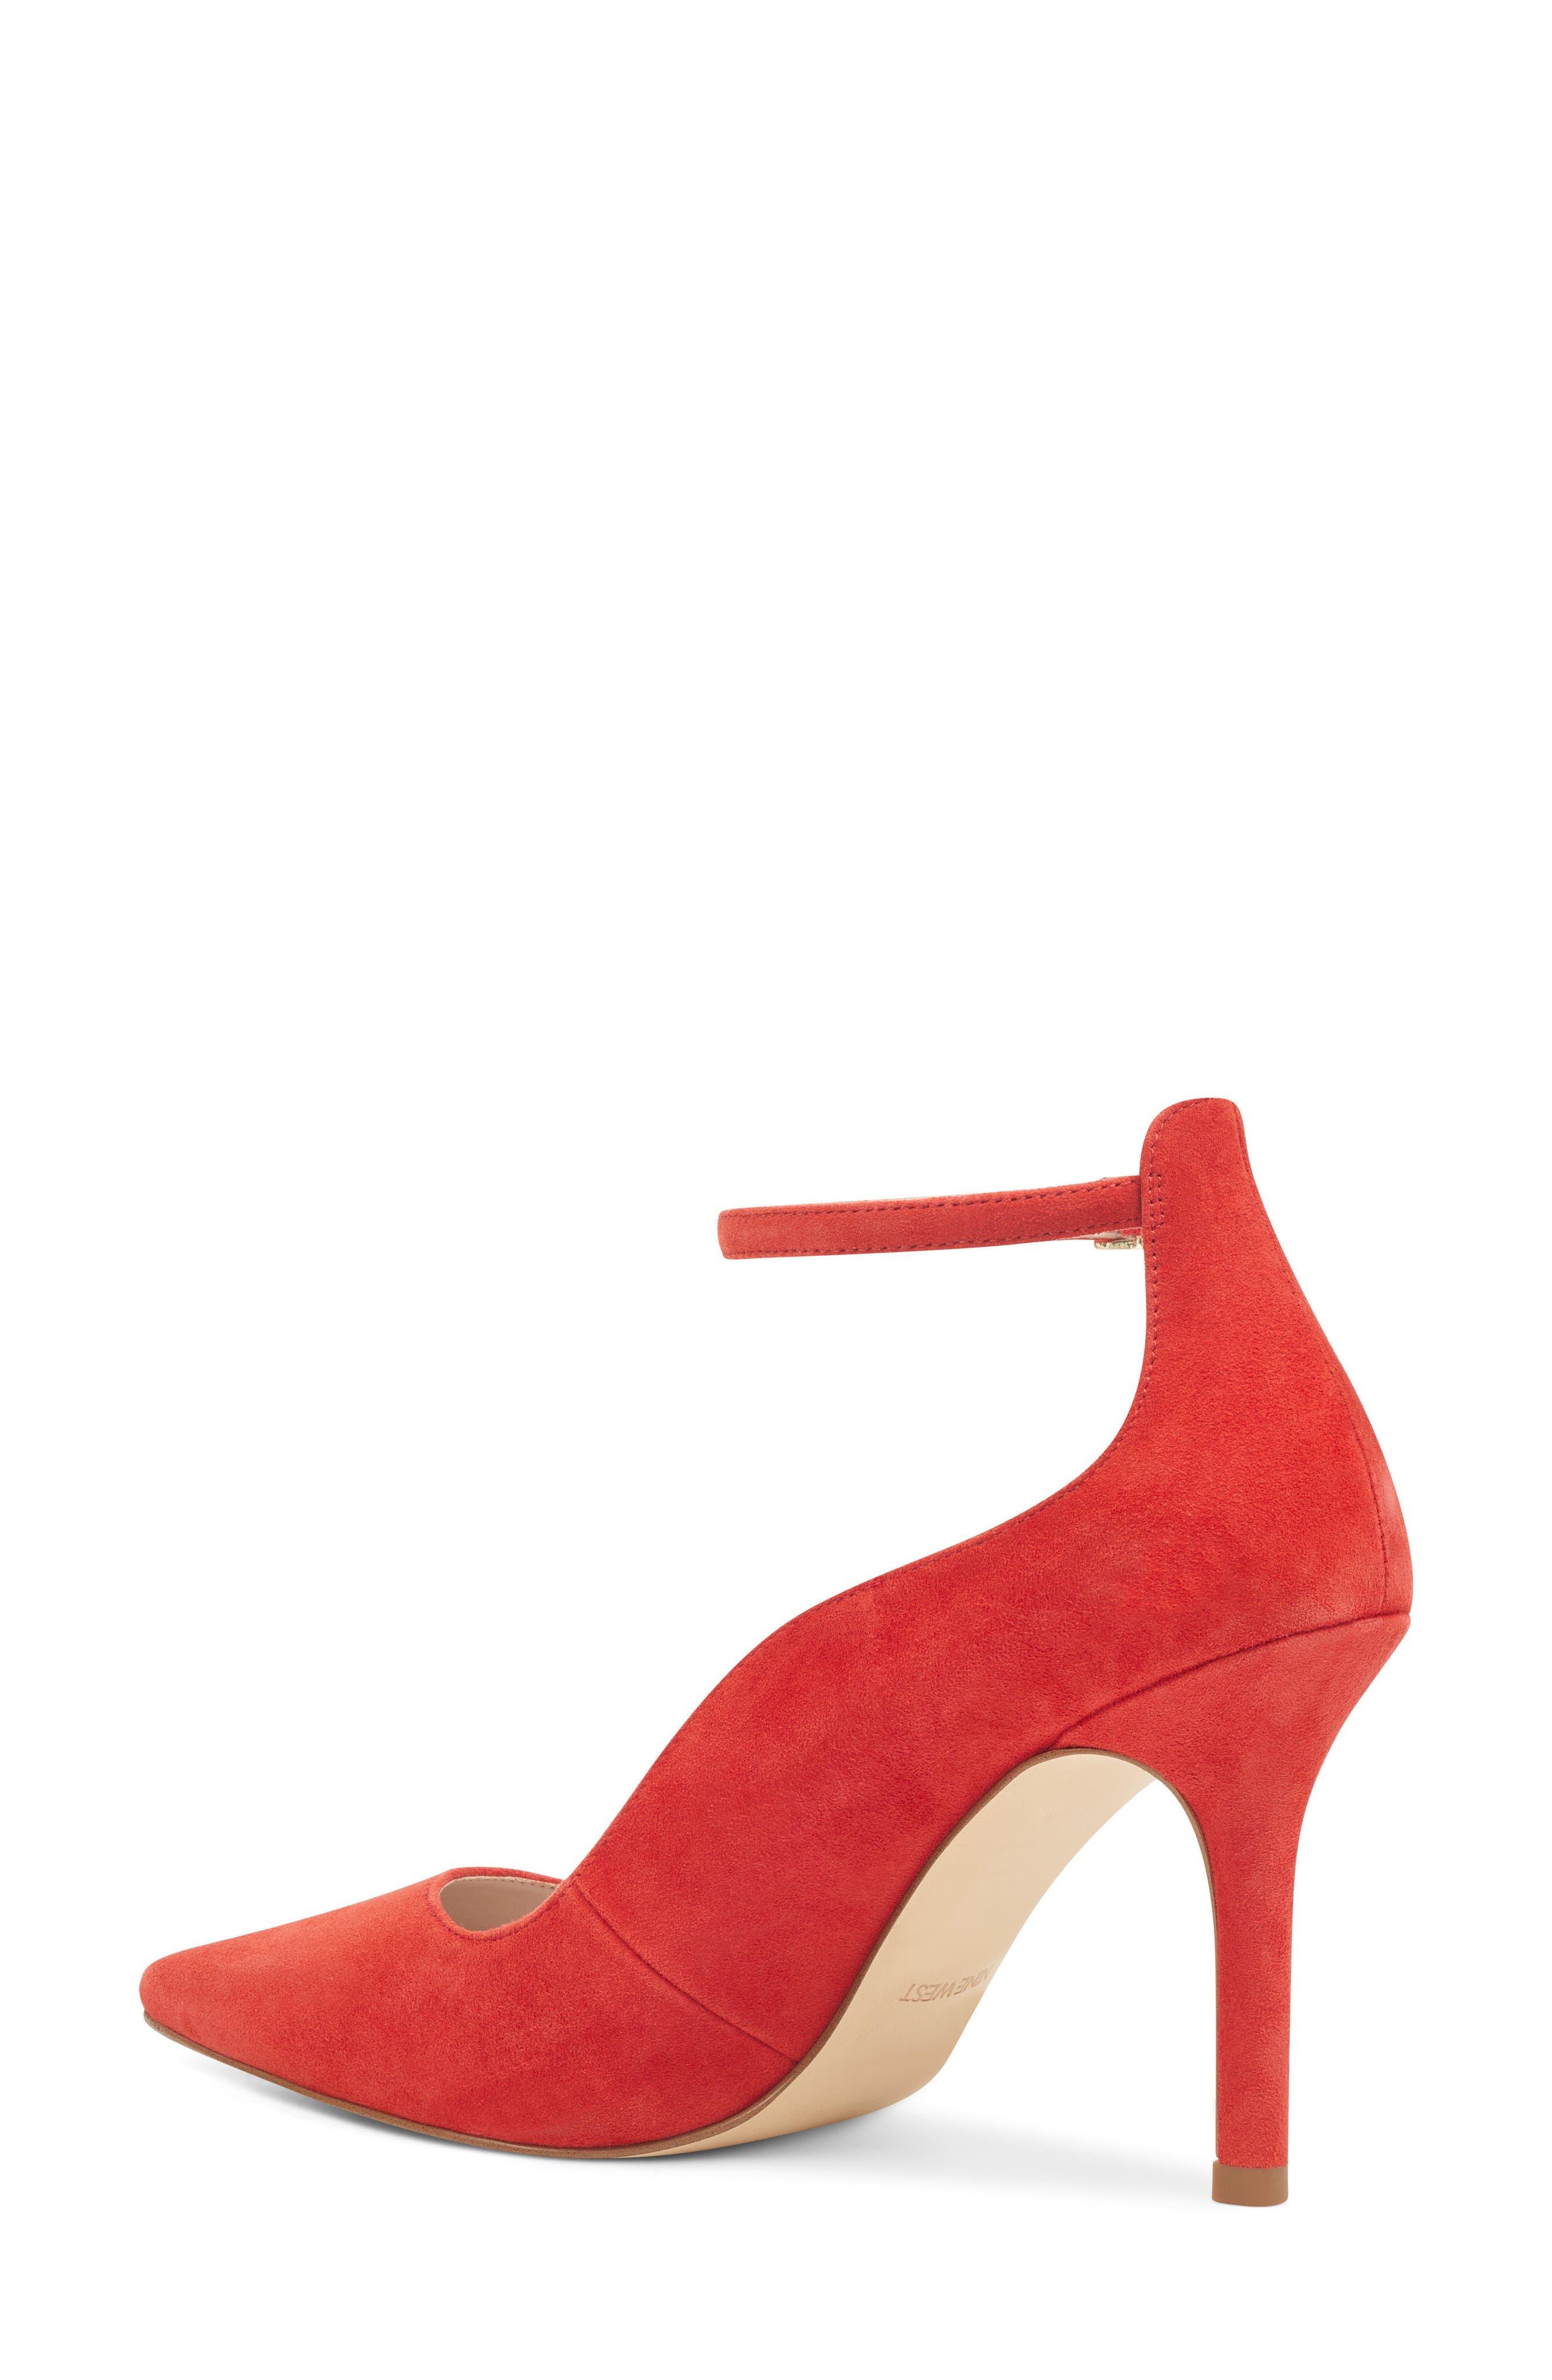 Marquisha Scalloped Ankle Strap Pump,                             Alternate thumbnail 6, color,